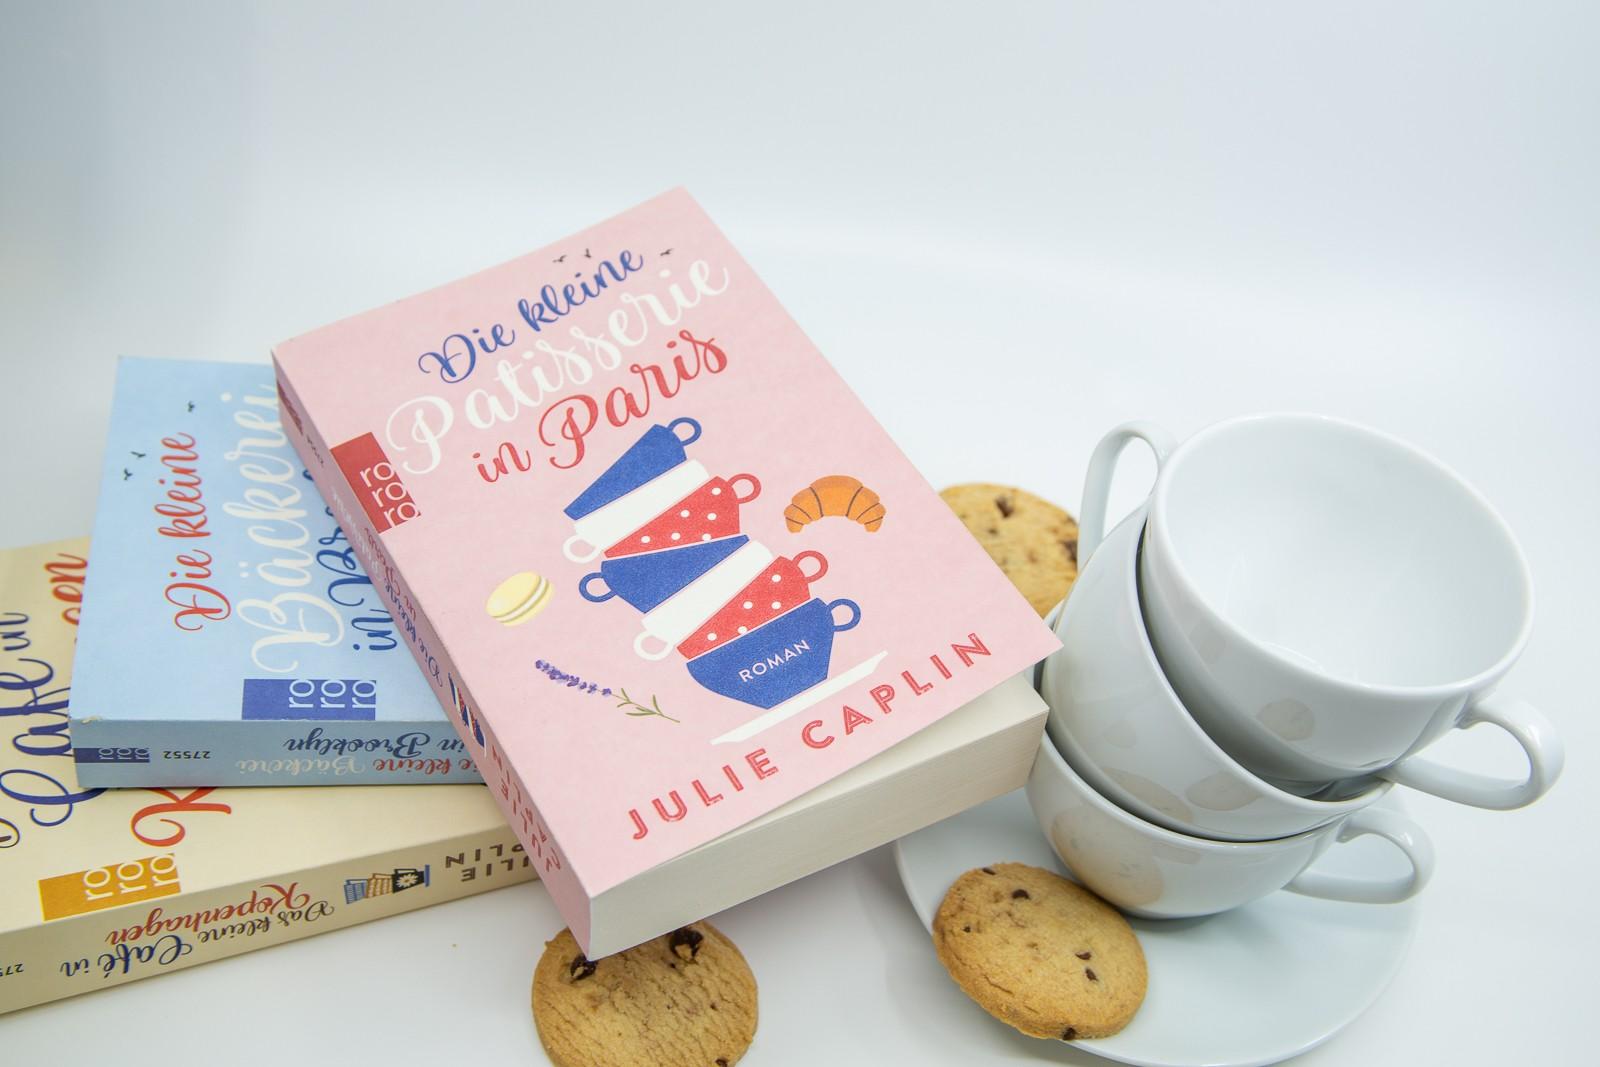 Die kleine Patisserie in Paris - Julie Caplin